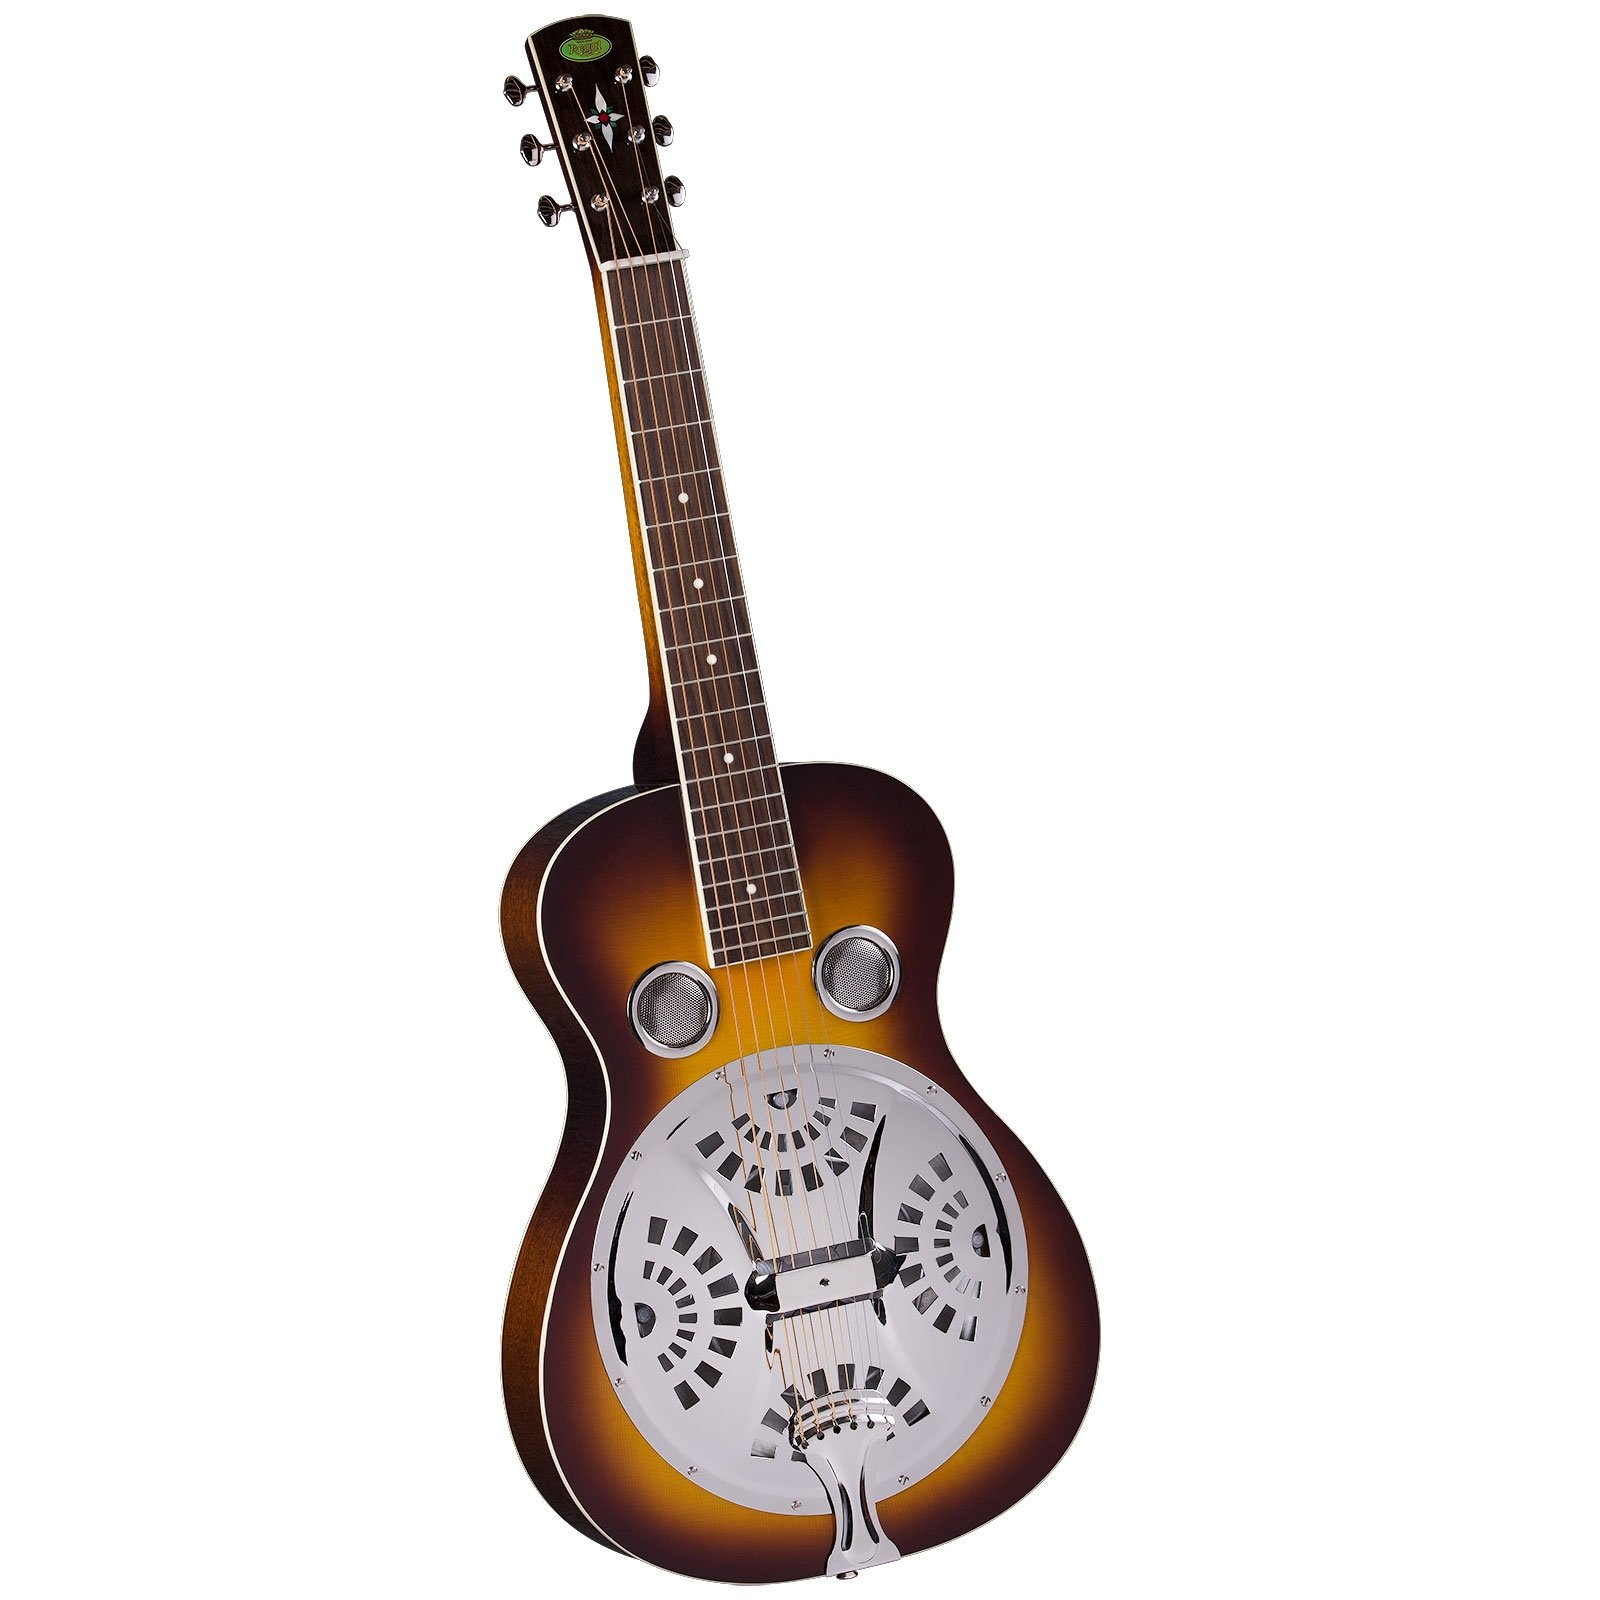 Regal RD-40VS Studio Series Squareneck Resophonic Guitar - Vintage Sunburst